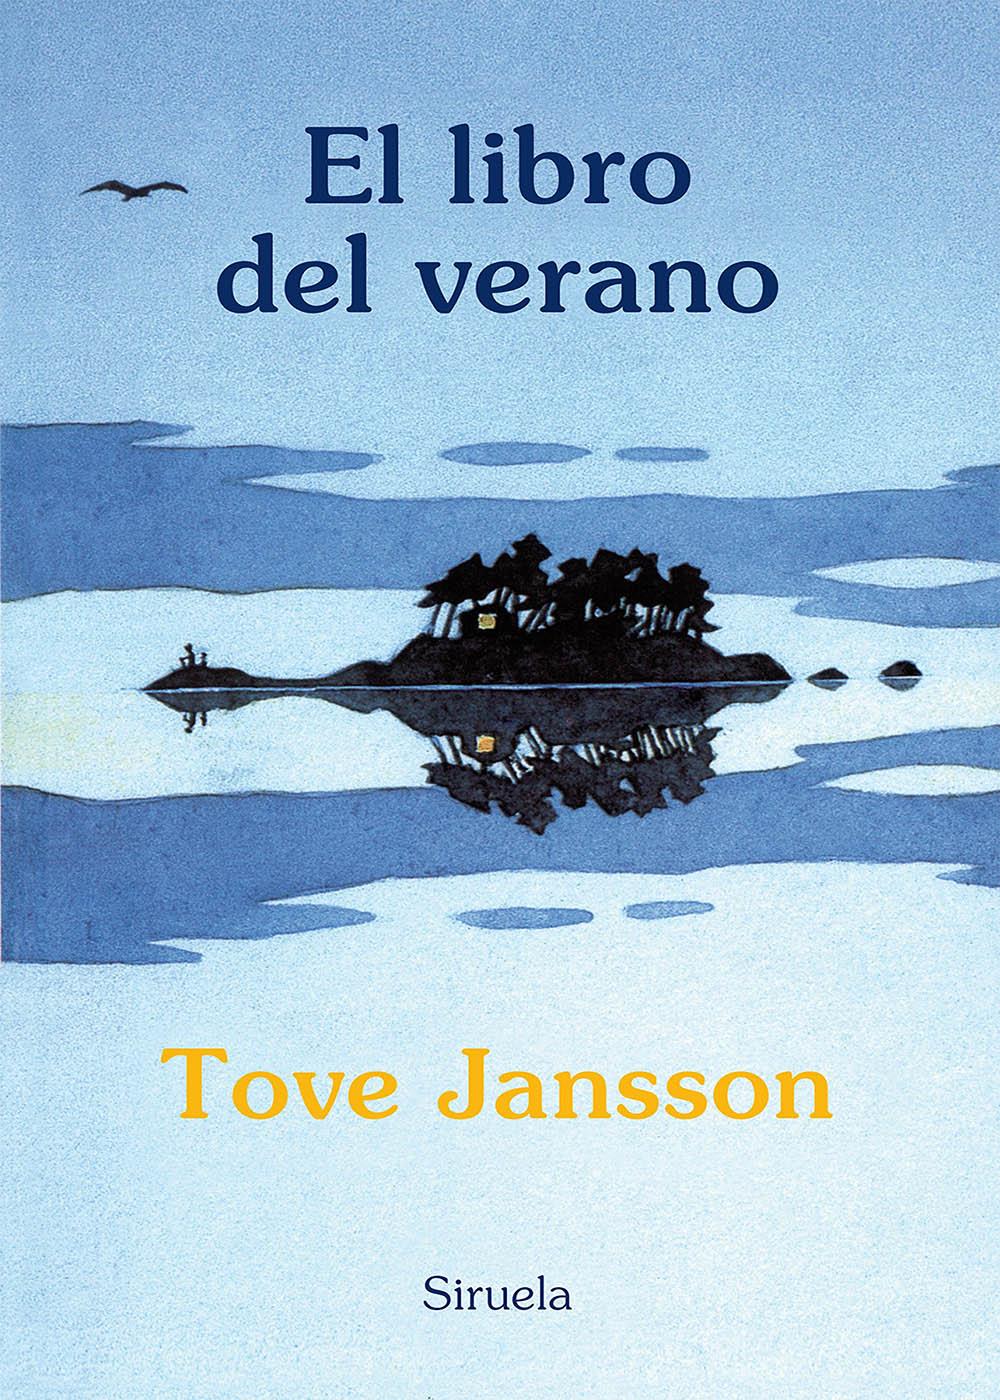 Tove Jansson - El libro del verano